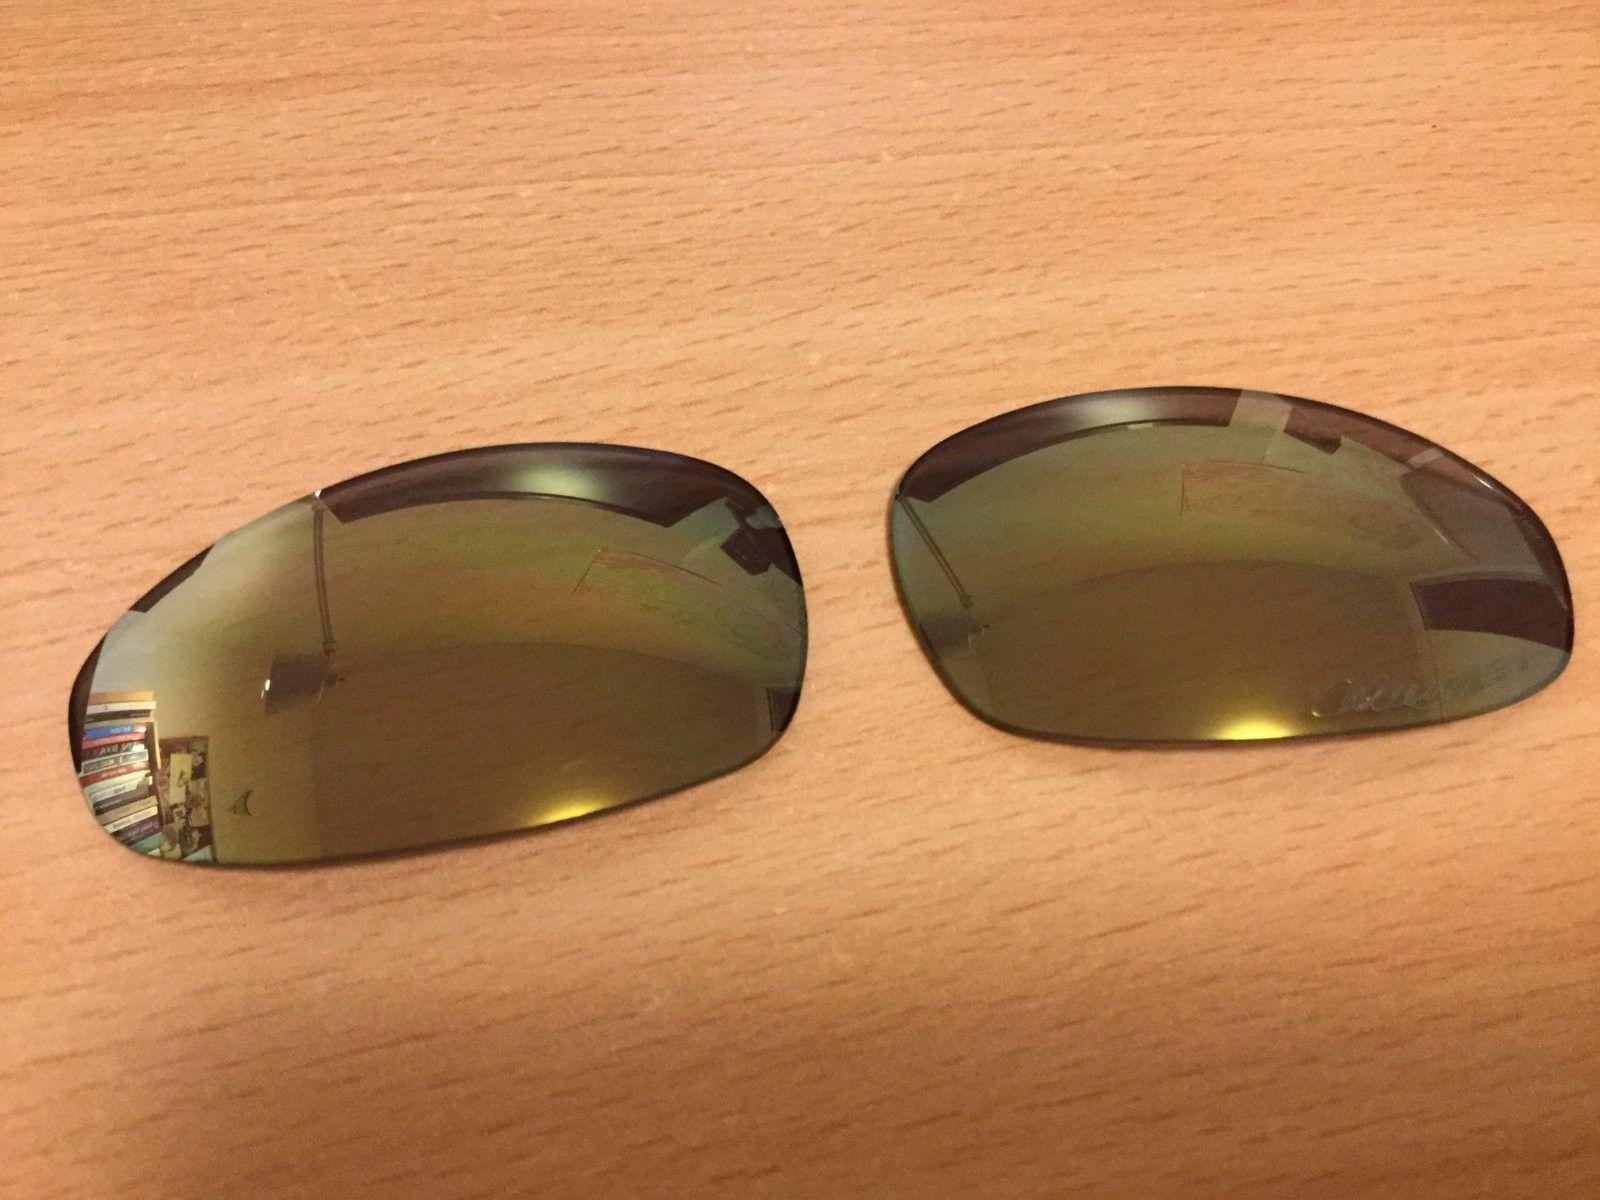 Ichiro Polished Emerald -  lens, rubber! - IMG_1627.JPG